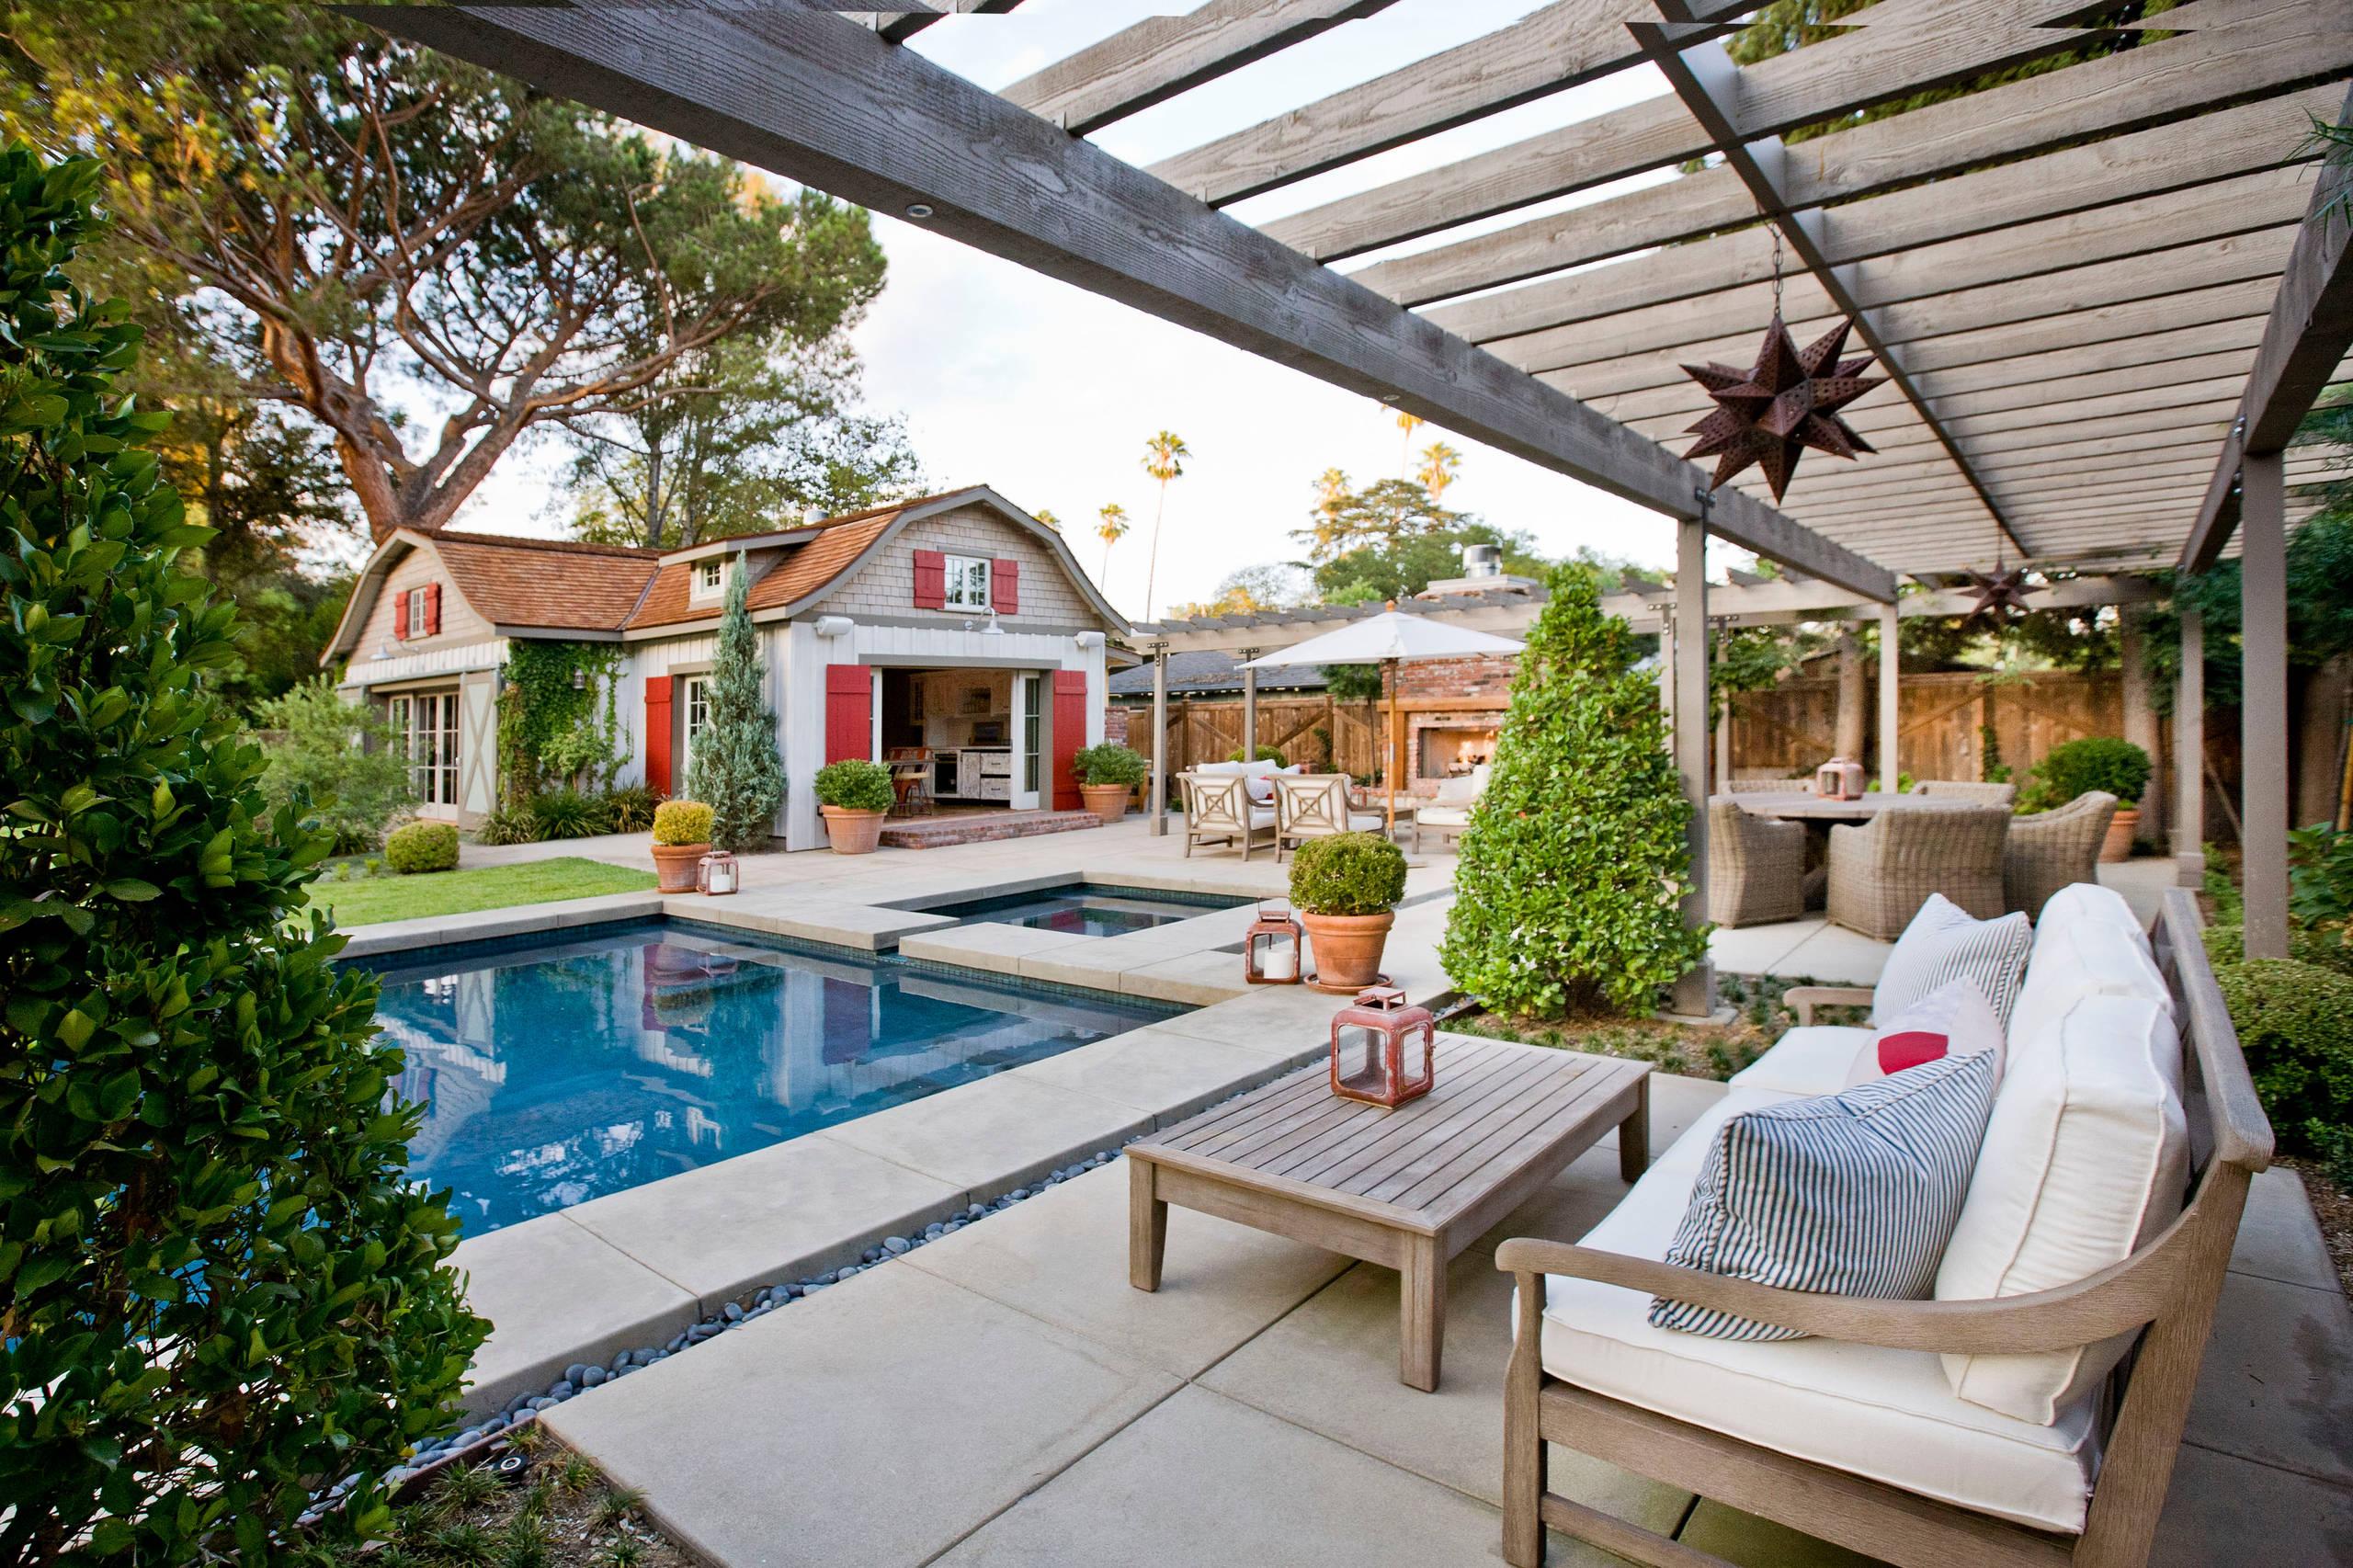 Shingle Style Barn and Poolhouse in Pasadena